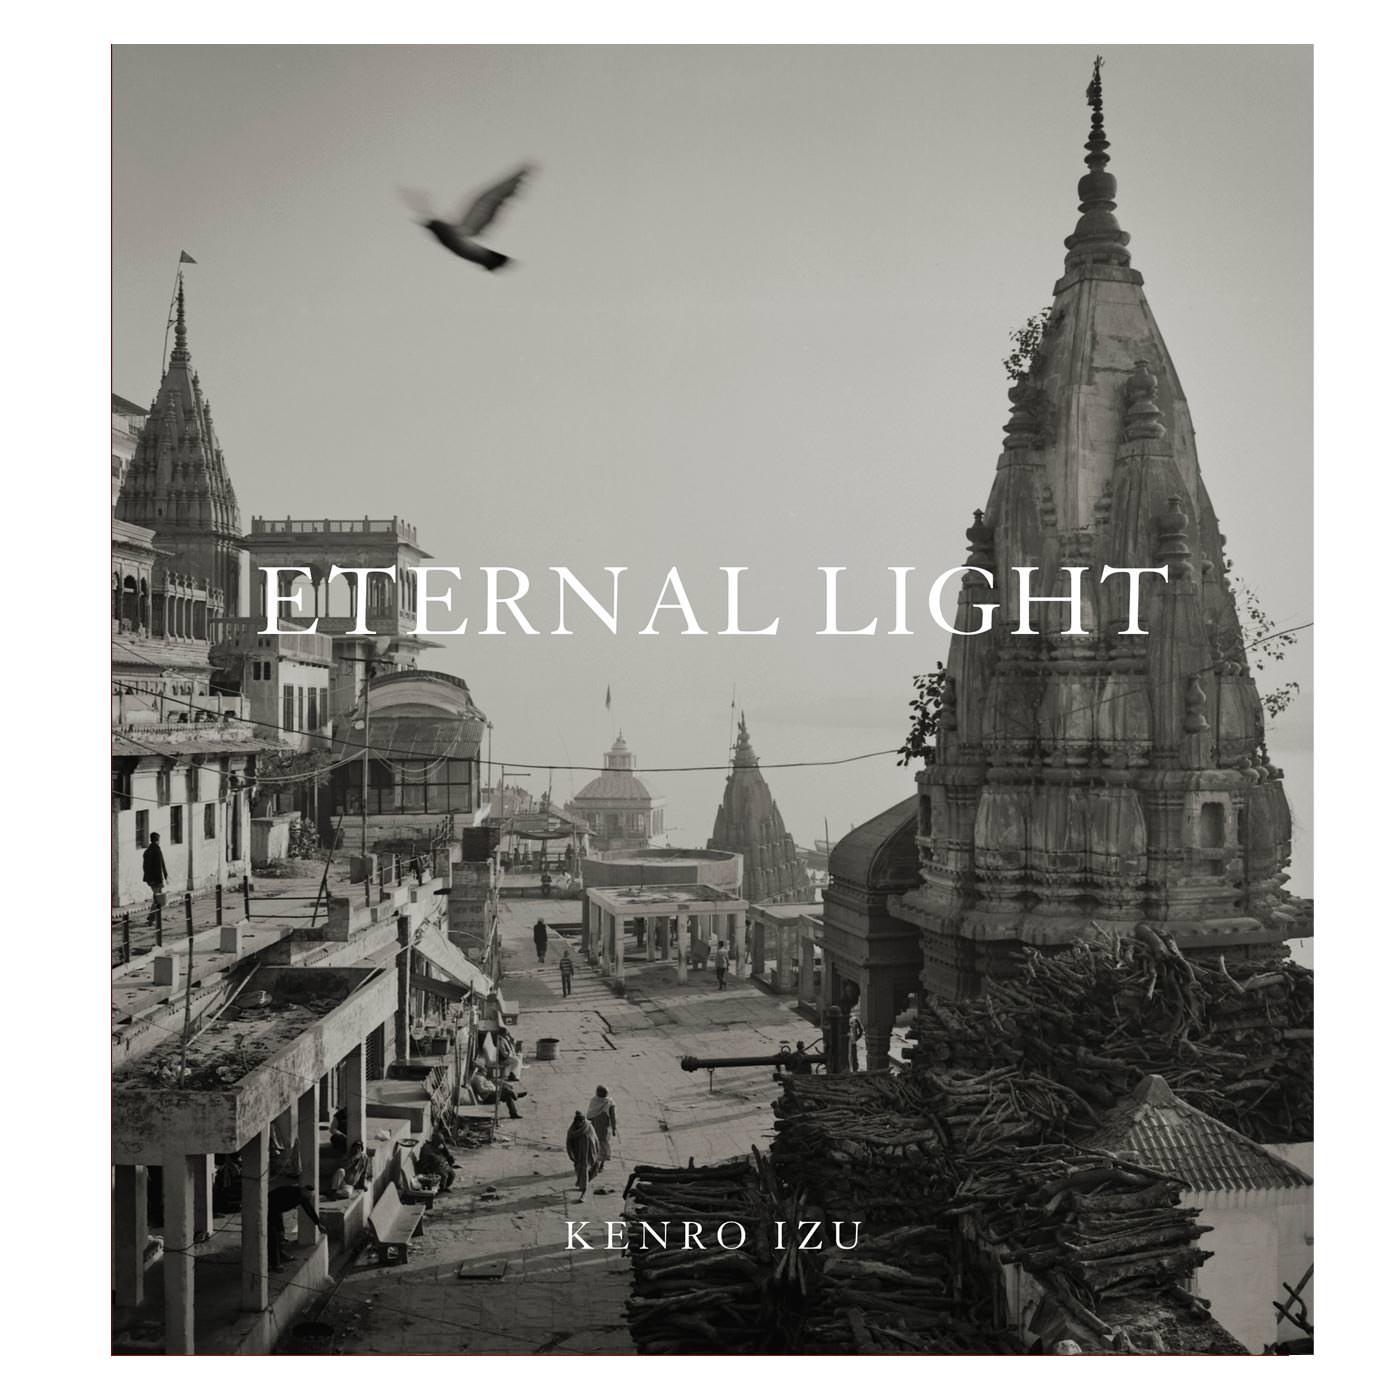 Kenro Izu, Eternal Light, Steidl